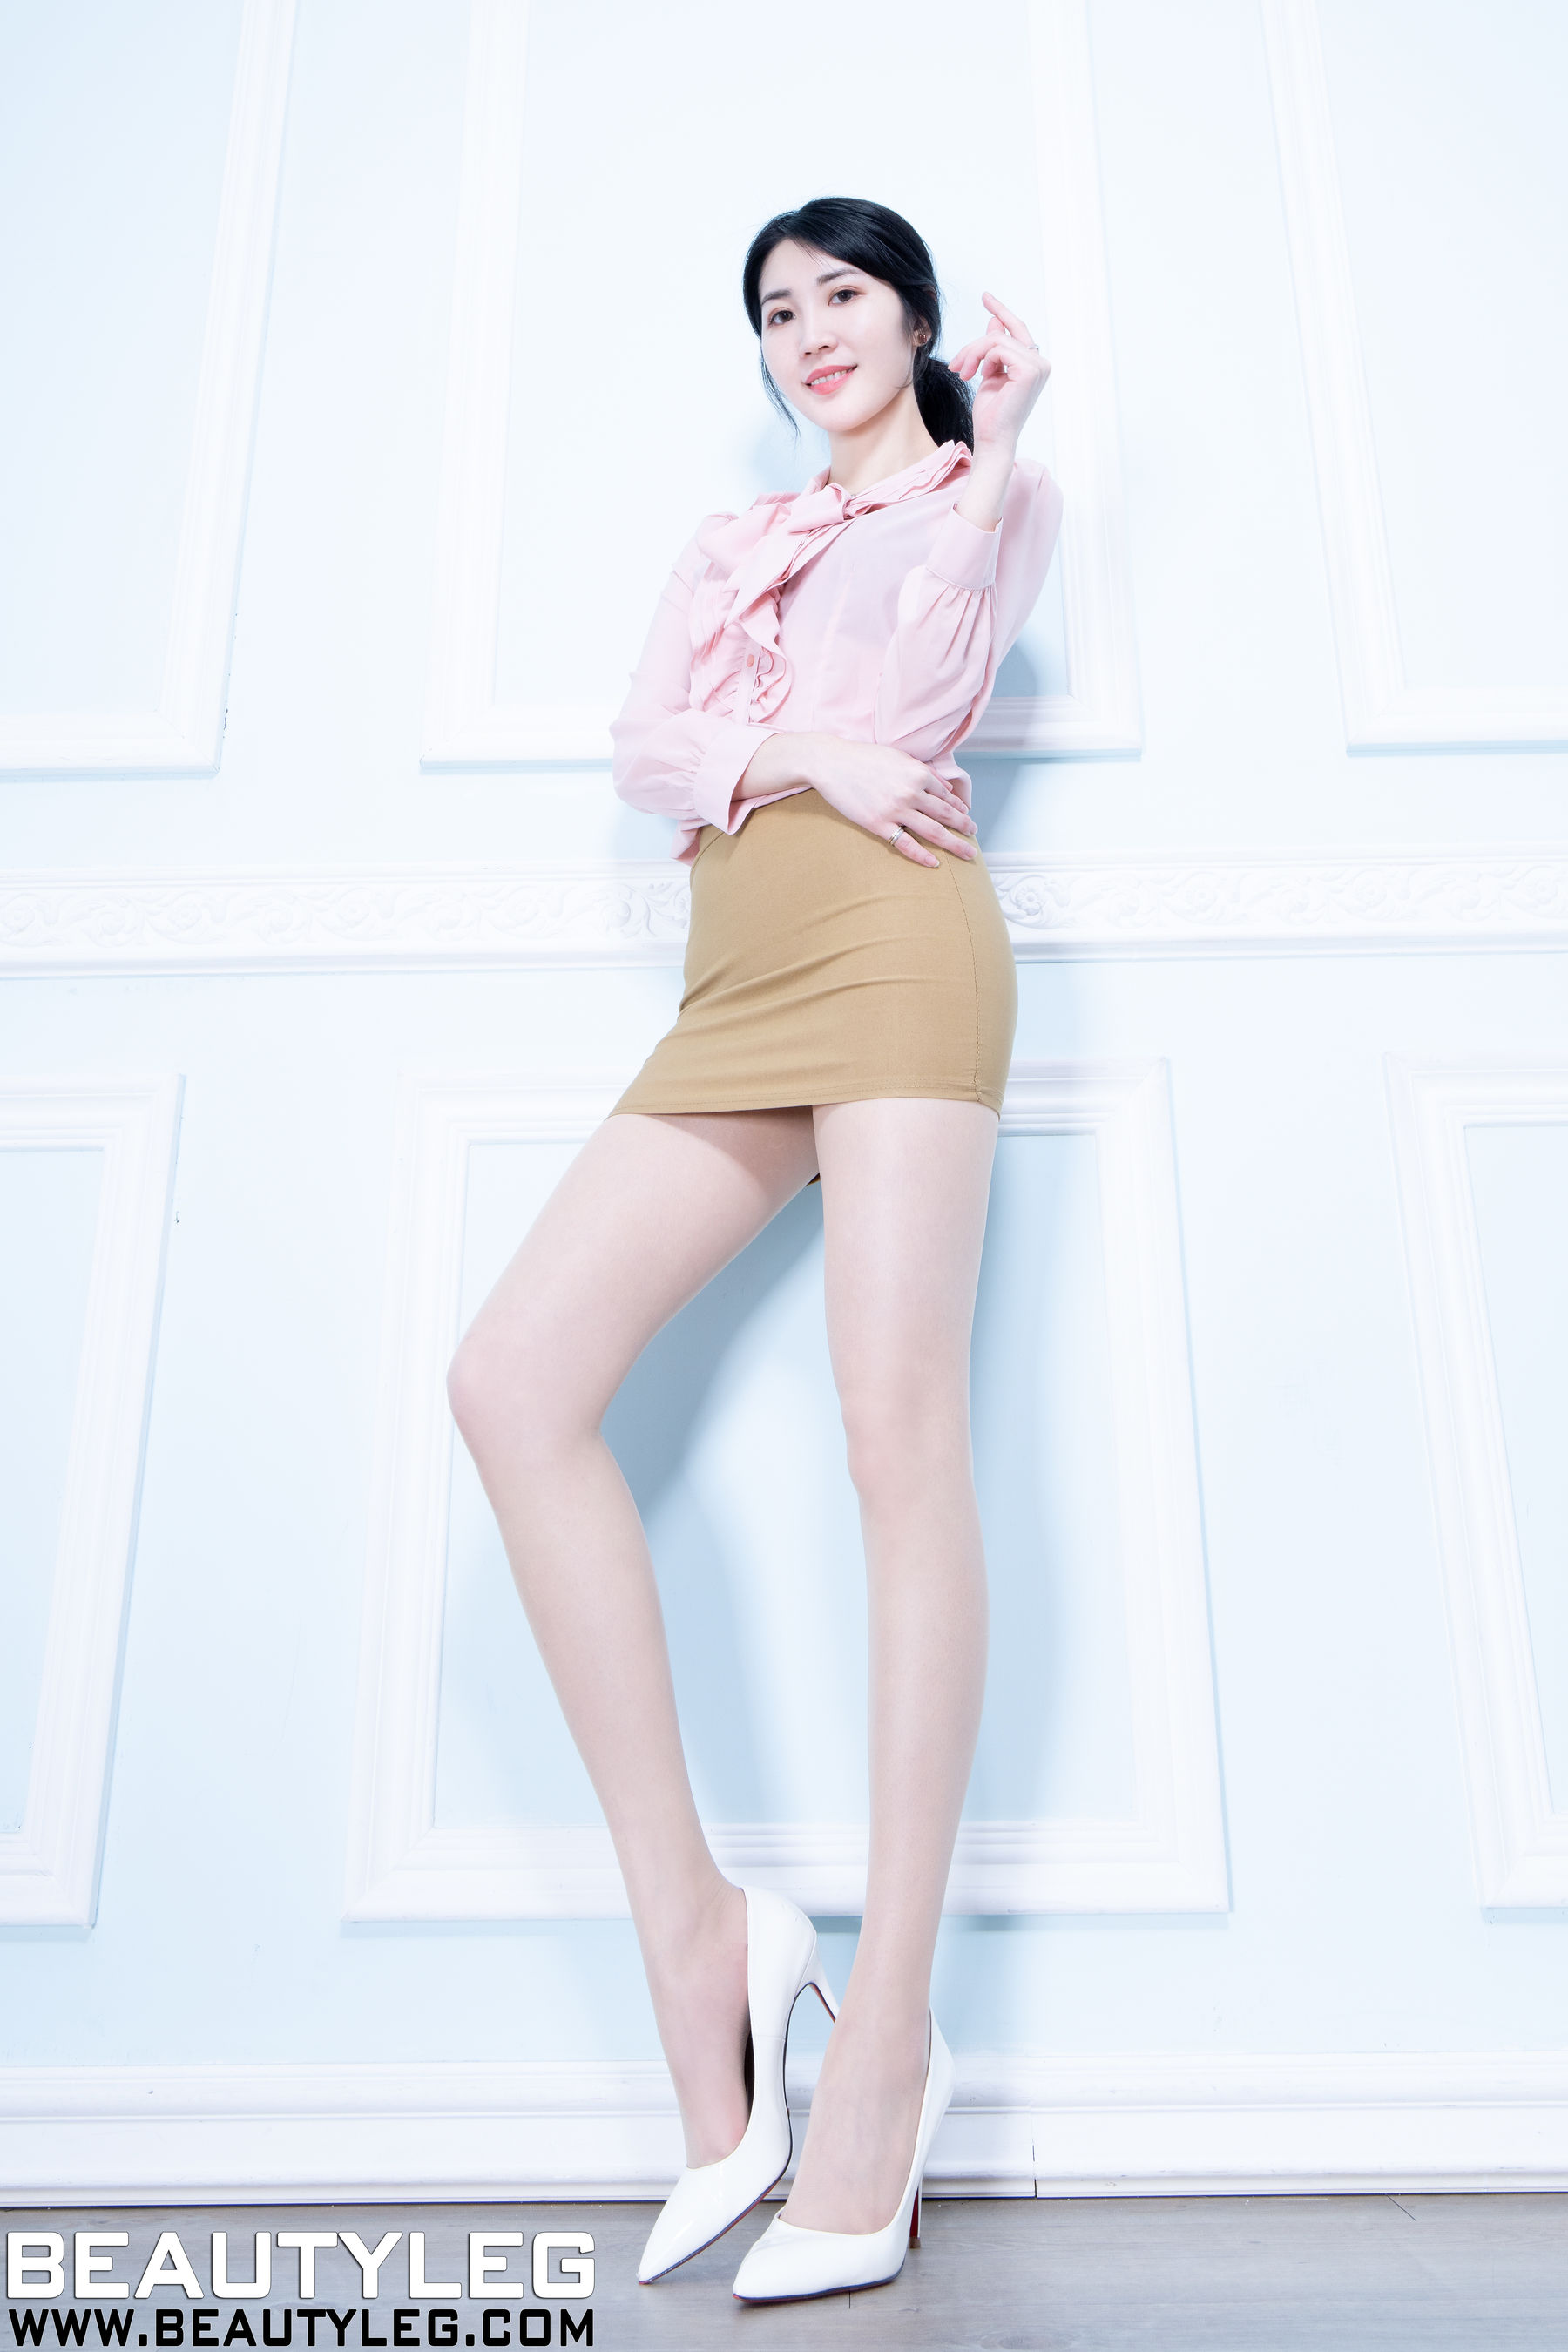 VOL.1270 [Beautyleg]丝袜制服:腿模Perri超高清个人性感漂亮大图(48P)